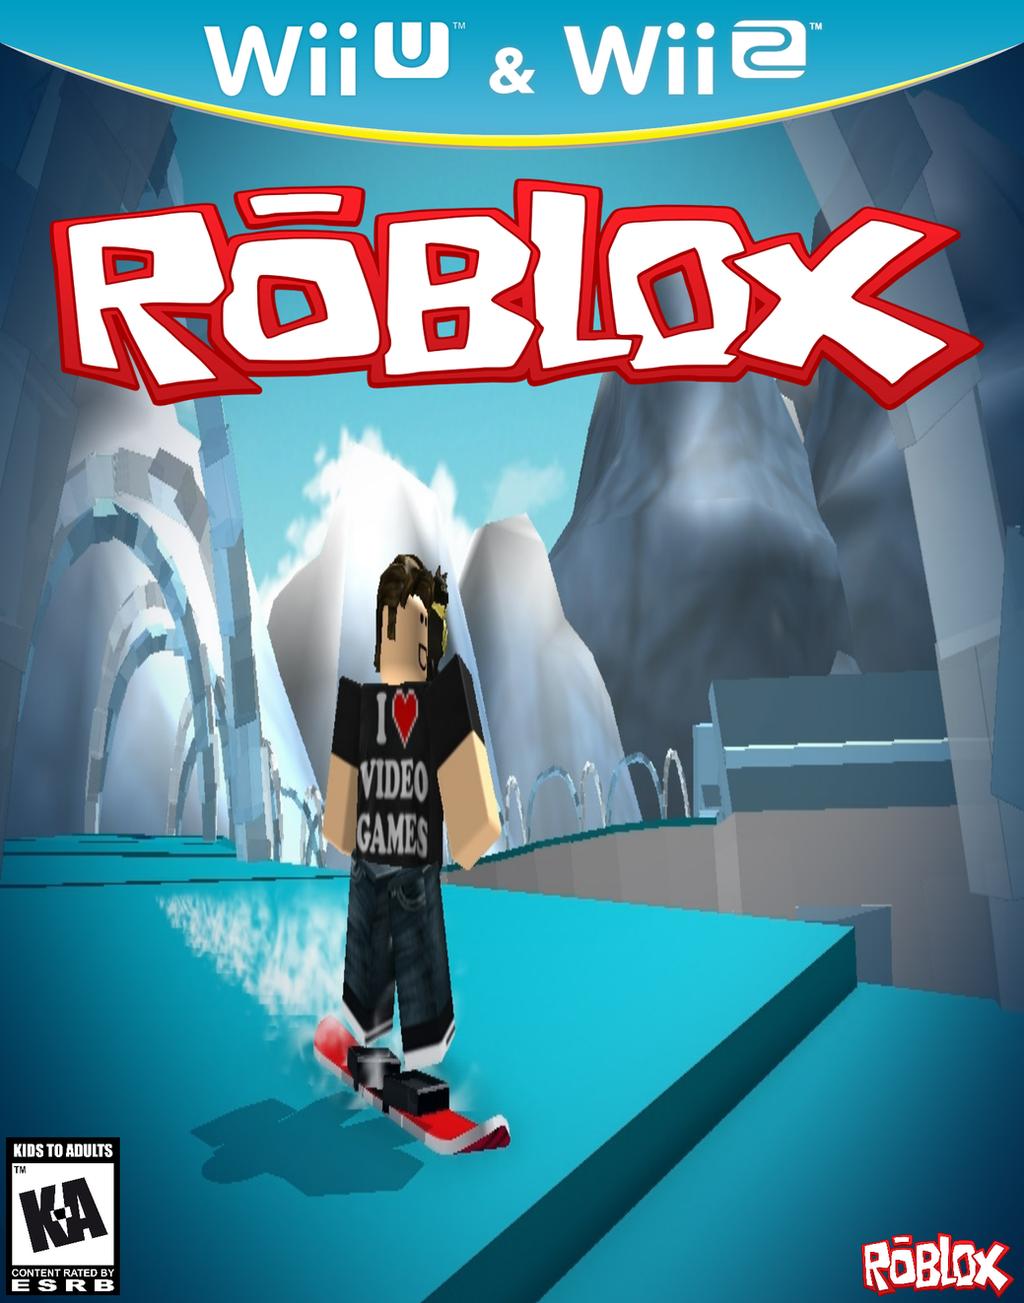 Roblox (Wii U) by ImAvalible1 on DeviantArt